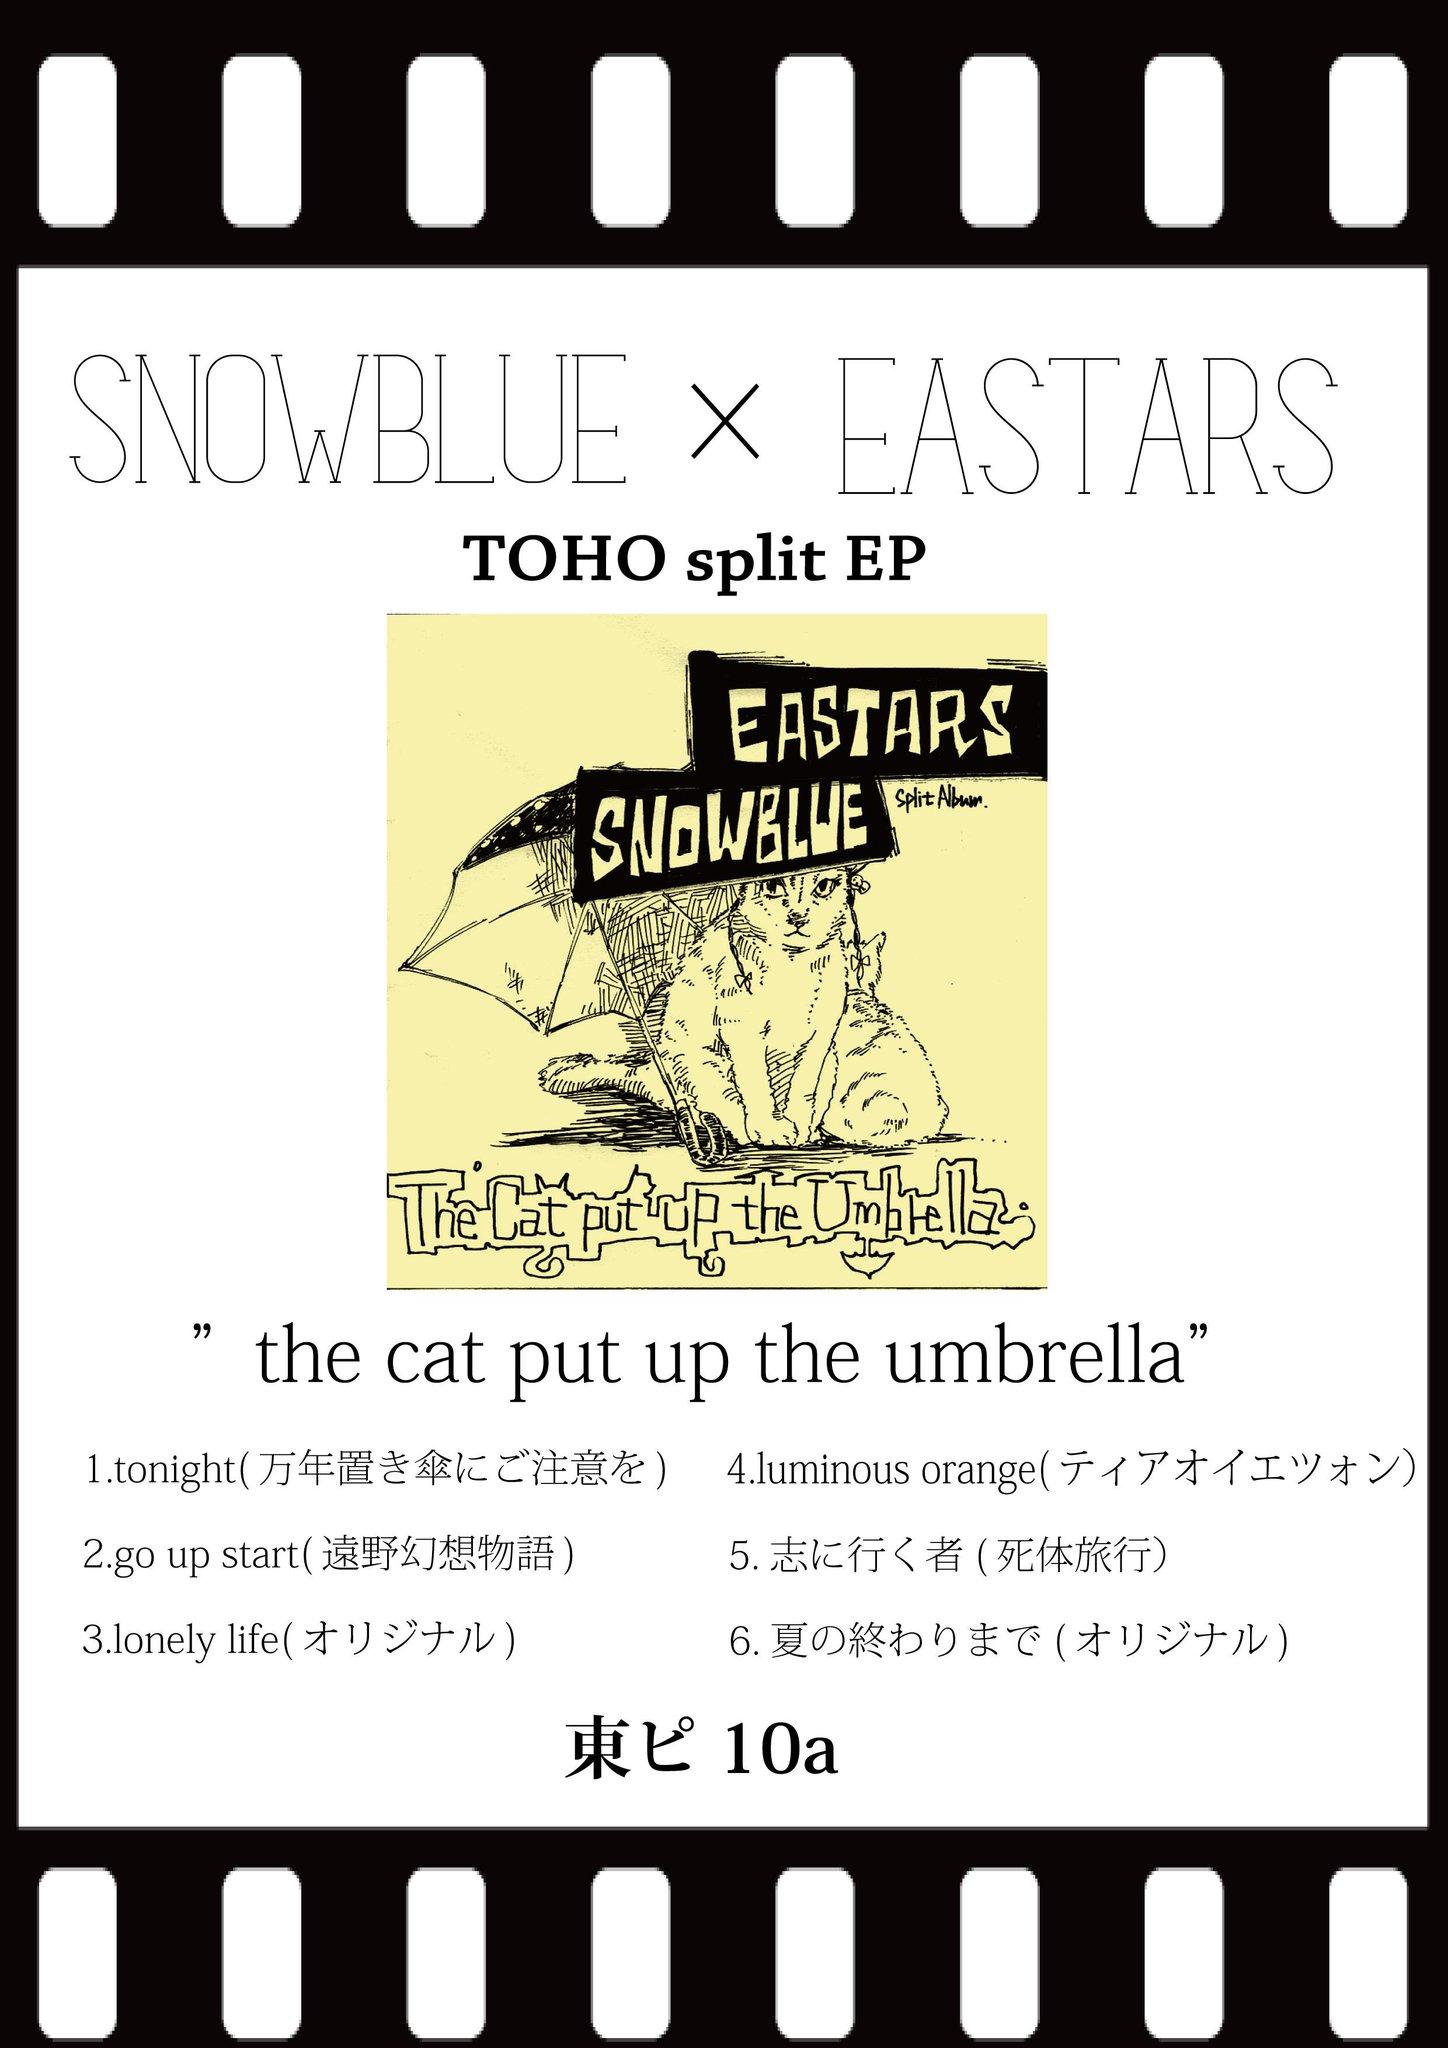 "2日目 東ピ10a  EASTARS SNOWBLUE  ""the cat put up the umbrella"" 6曲入 300円  試聴→http://t.co/h3Q15FyDxt http://t.co/4ePkGjbqrv http://t.co/q6WaUQ4nbX"